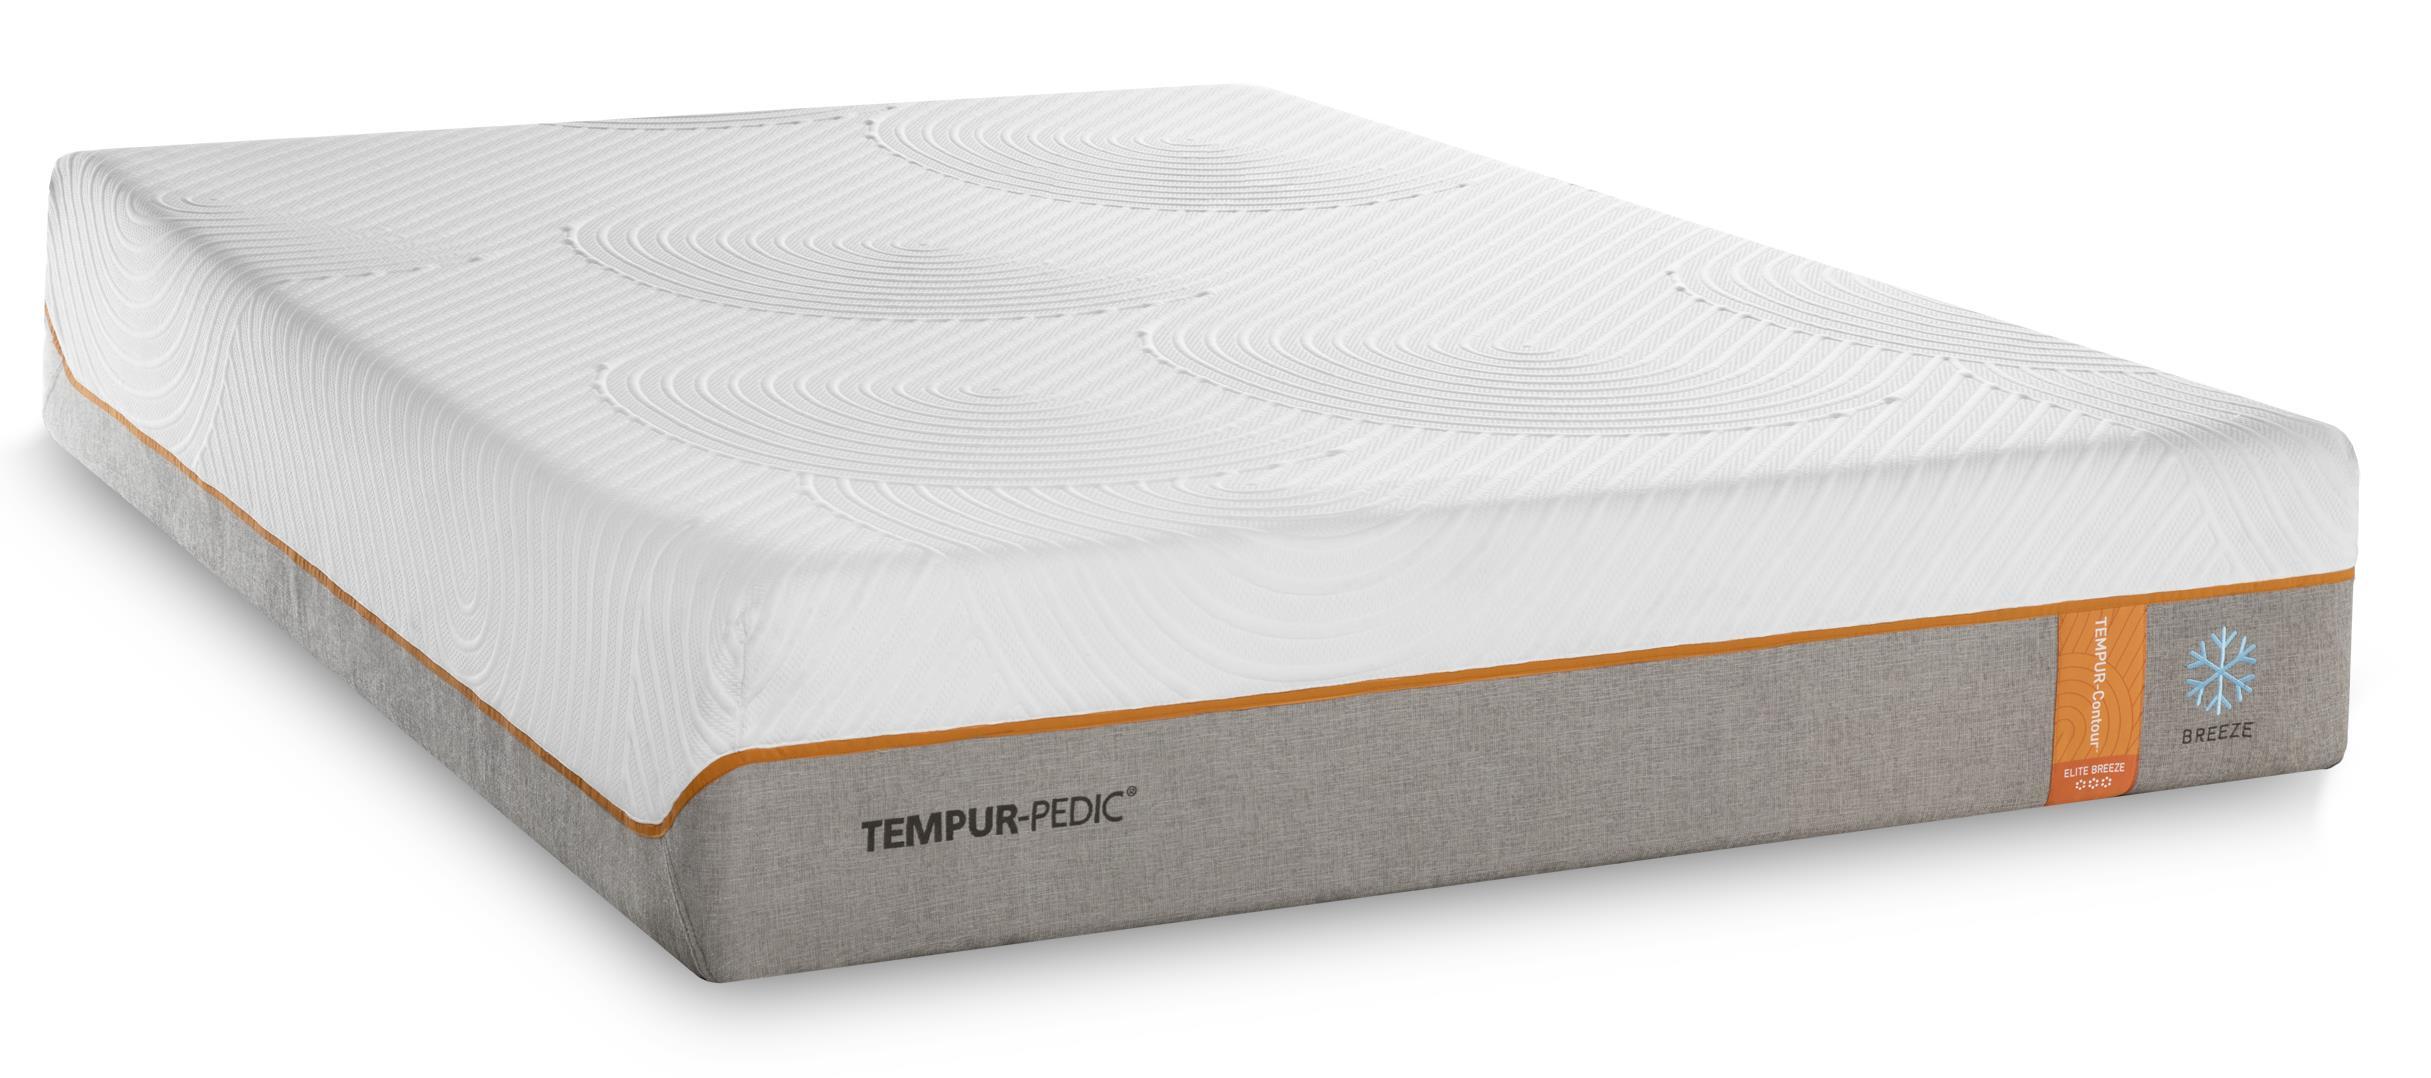 Tempur-Pedic® TEMPUR-Contour Elite Breeze King Medium-Firm Mattress Set - Item Number: 10290270+2x25287120